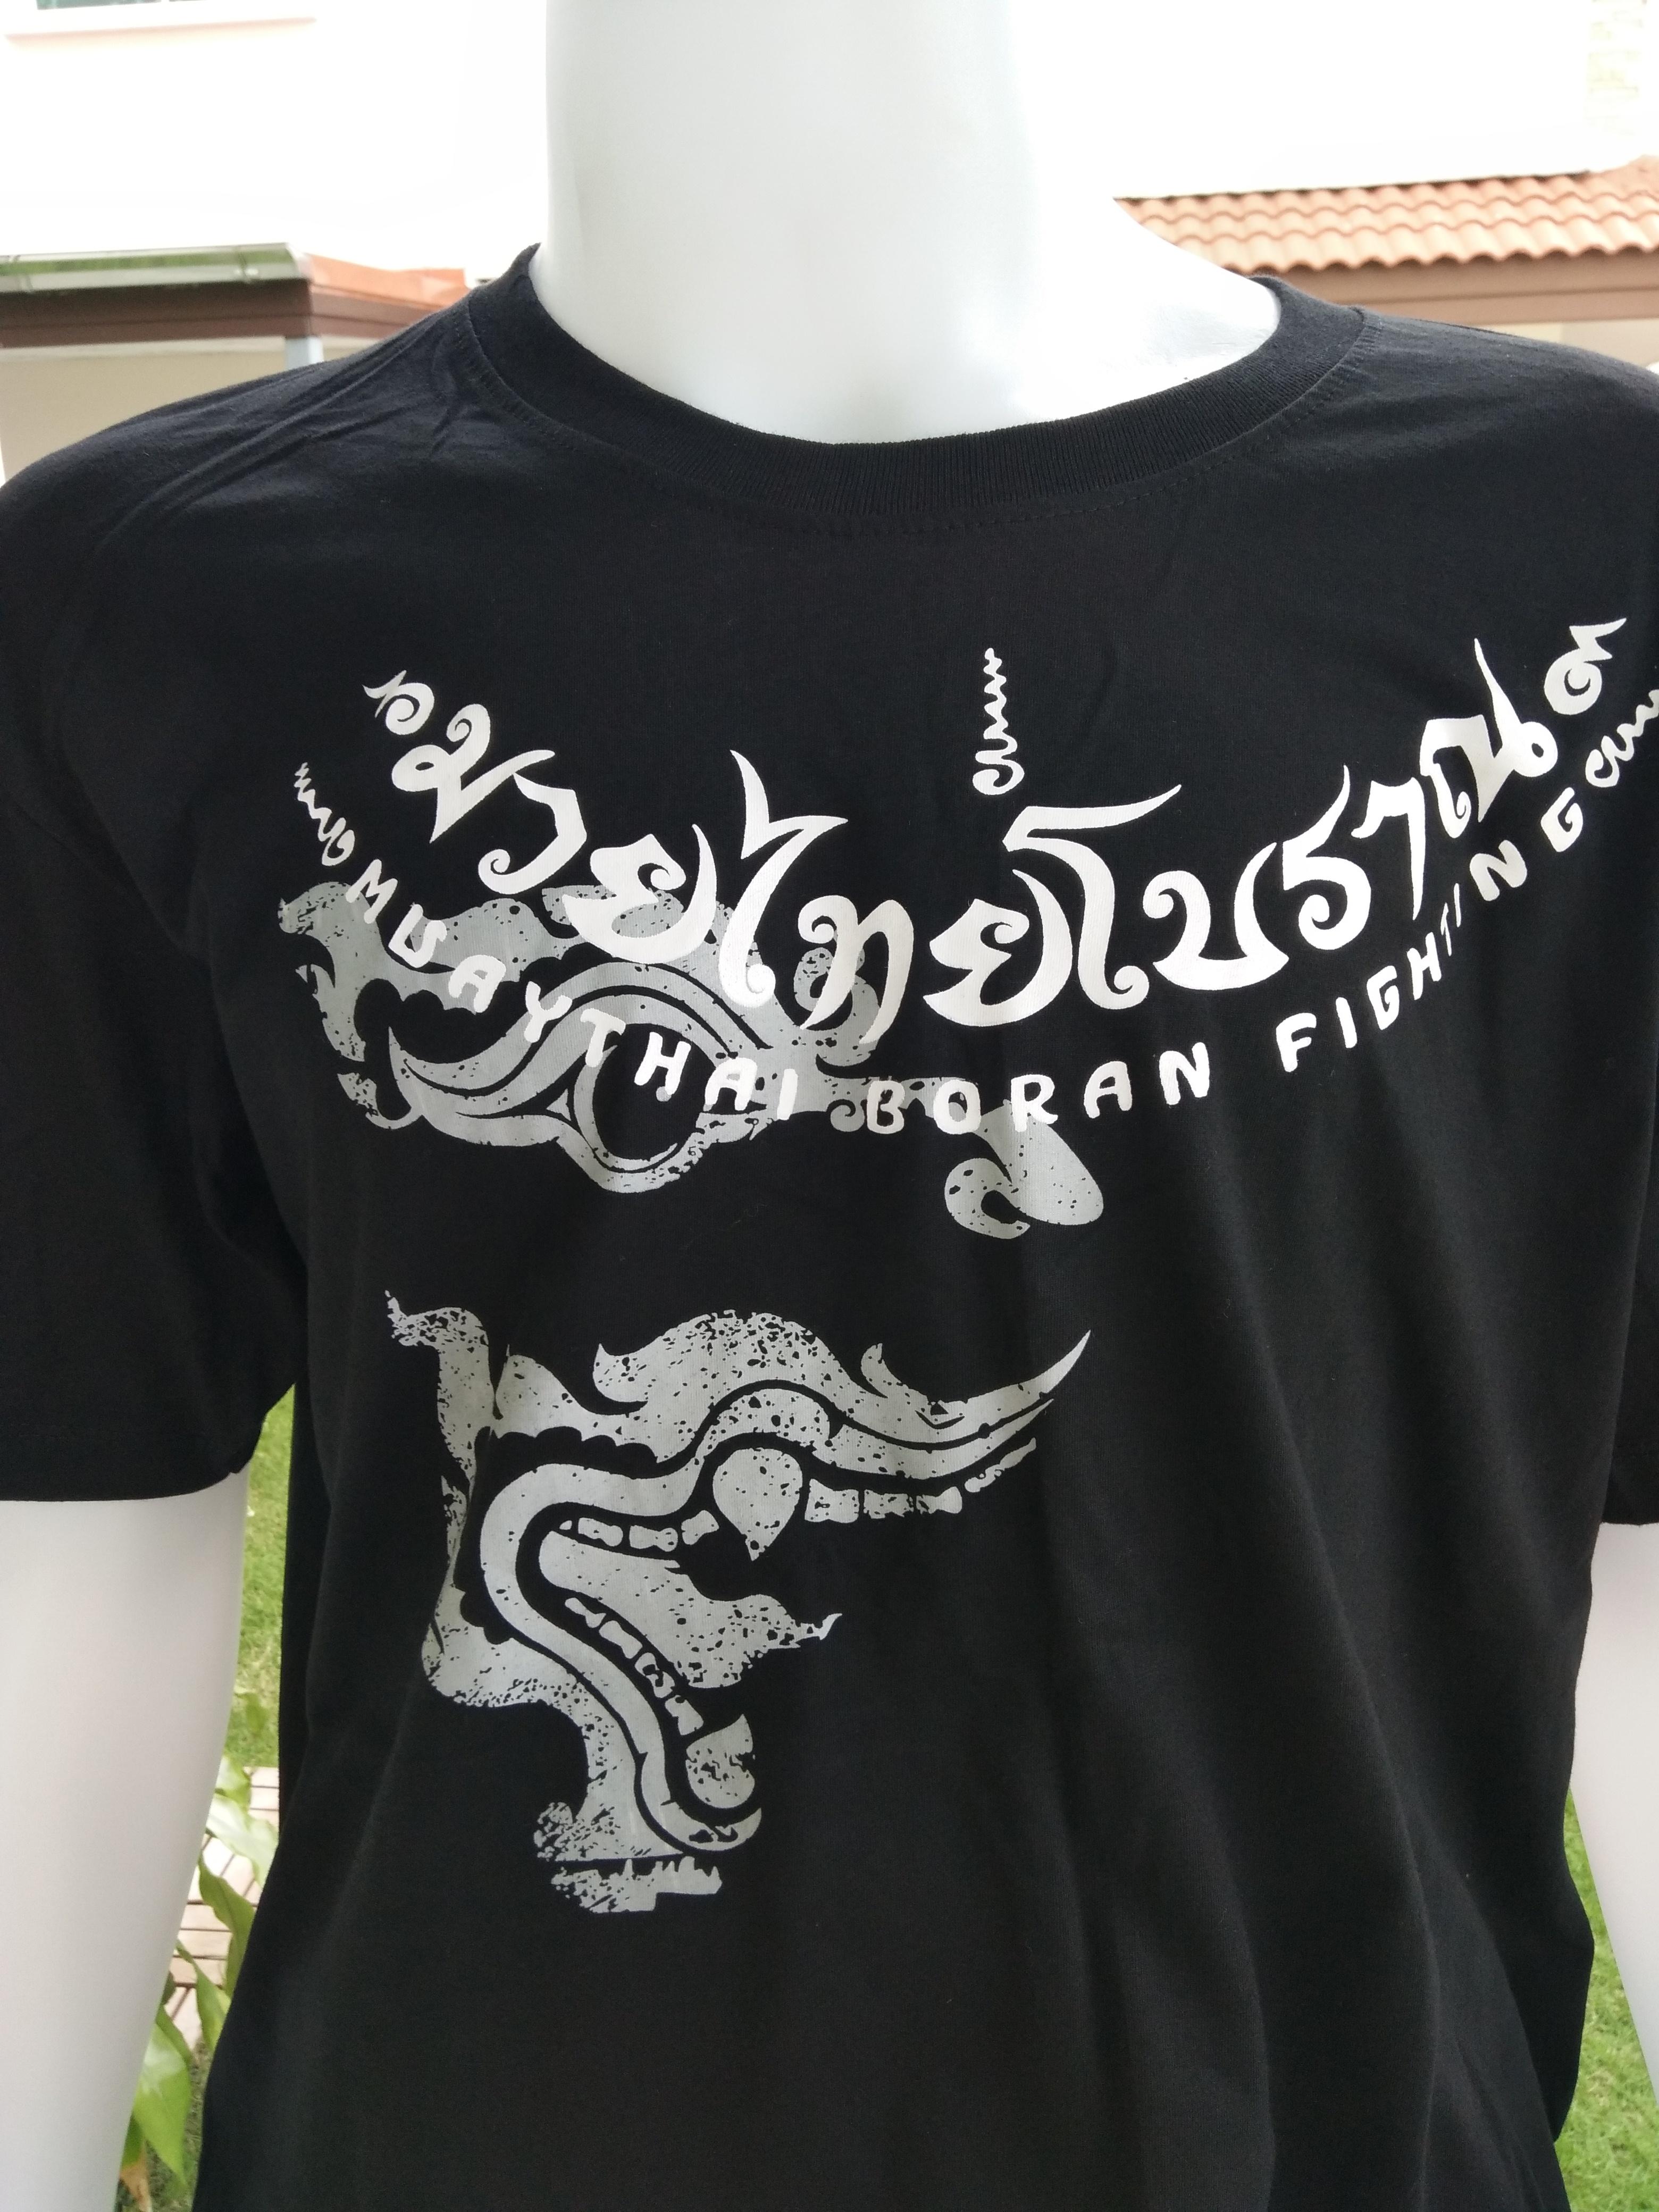 Muayboran T-shirt